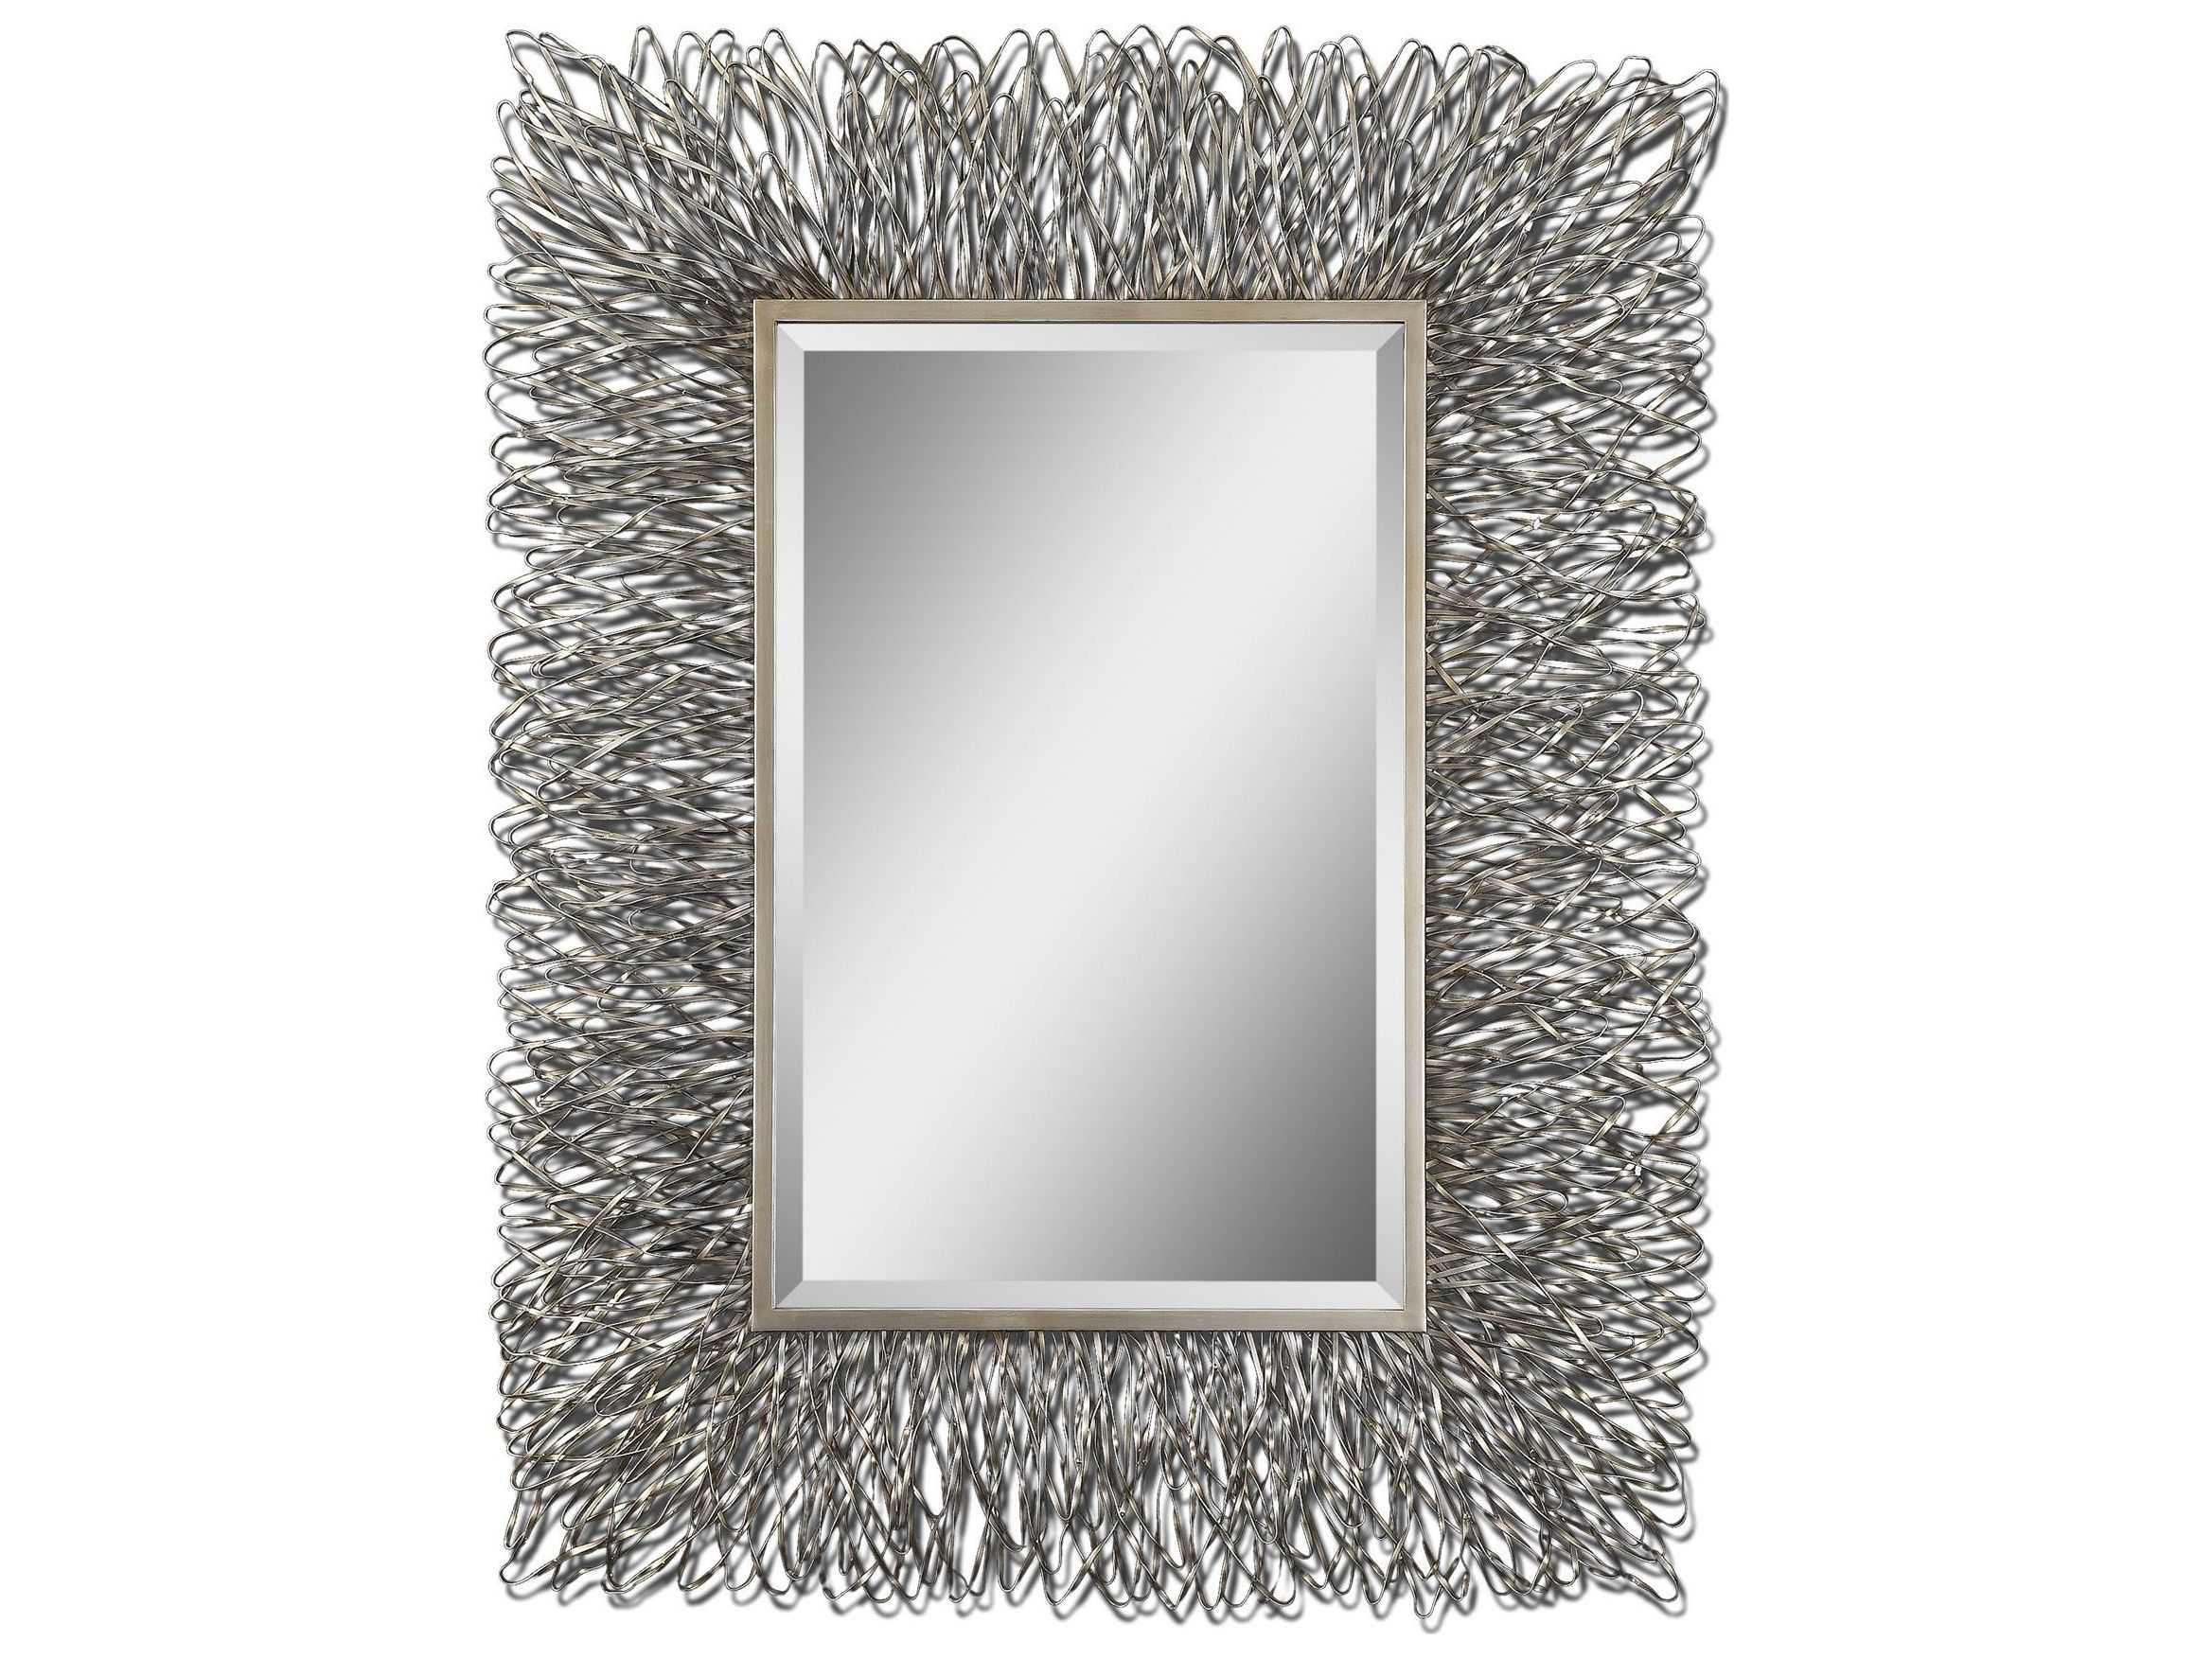 Uttermost Corbis 44 X 56 Decorative Metal Wall Mirror Ut07627